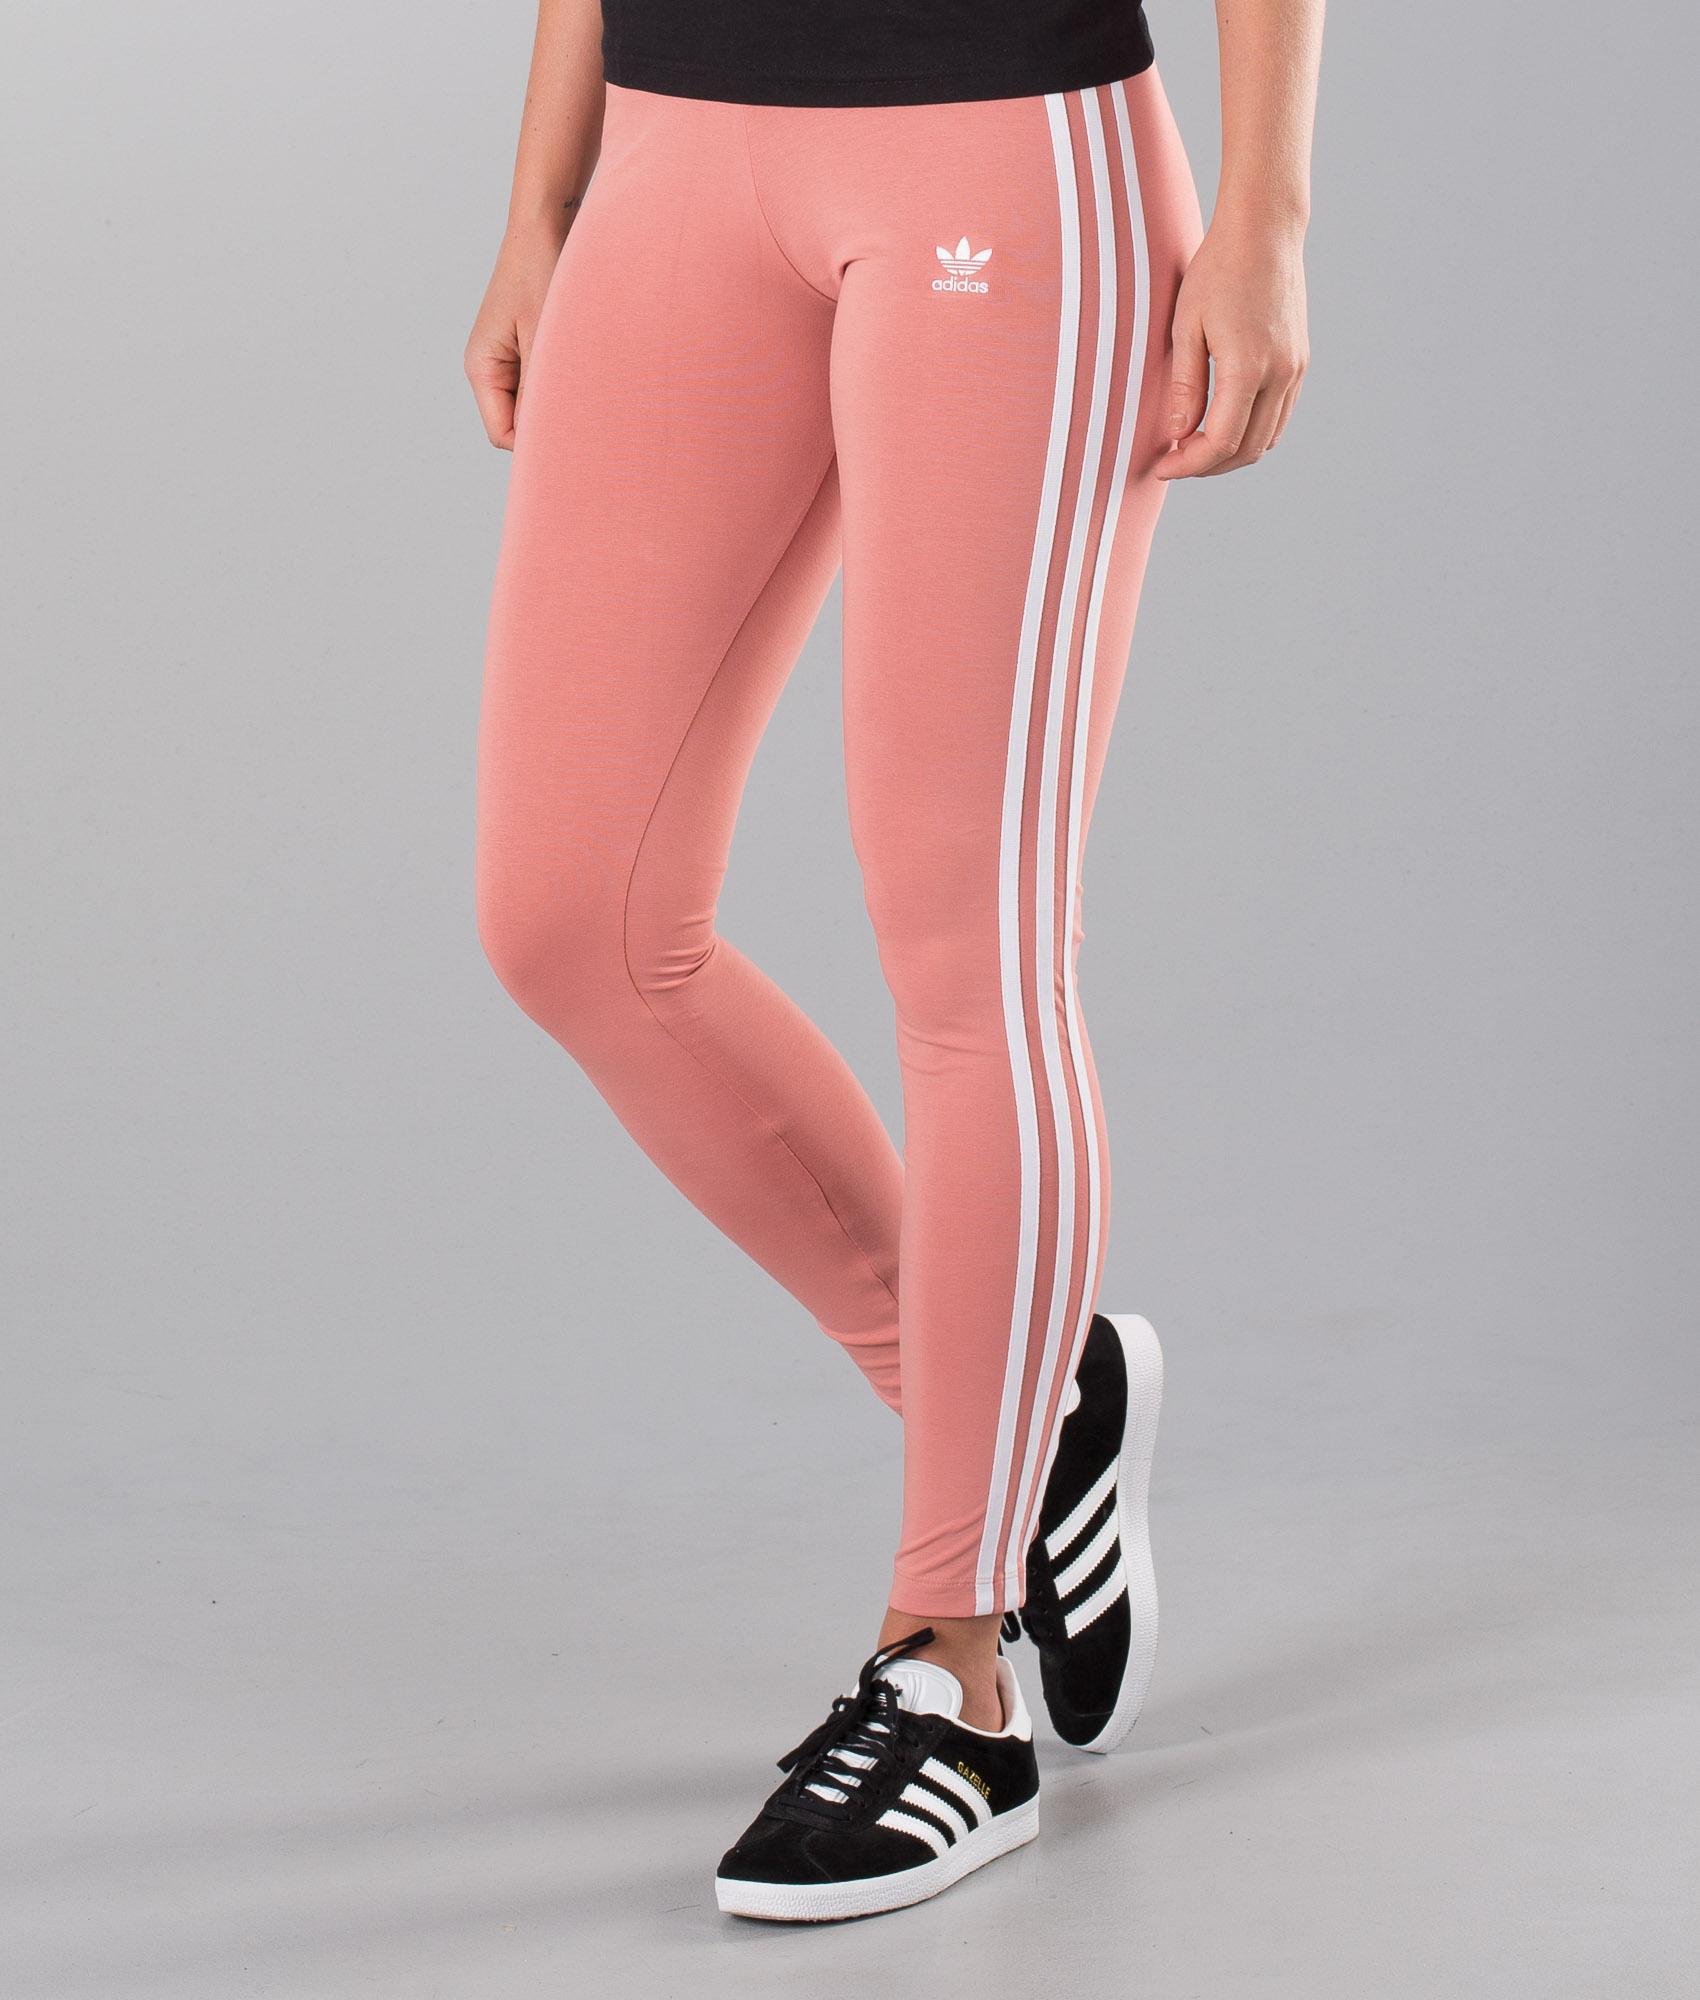 Adidas Originals 3 Stripes Leggings Ash Pink